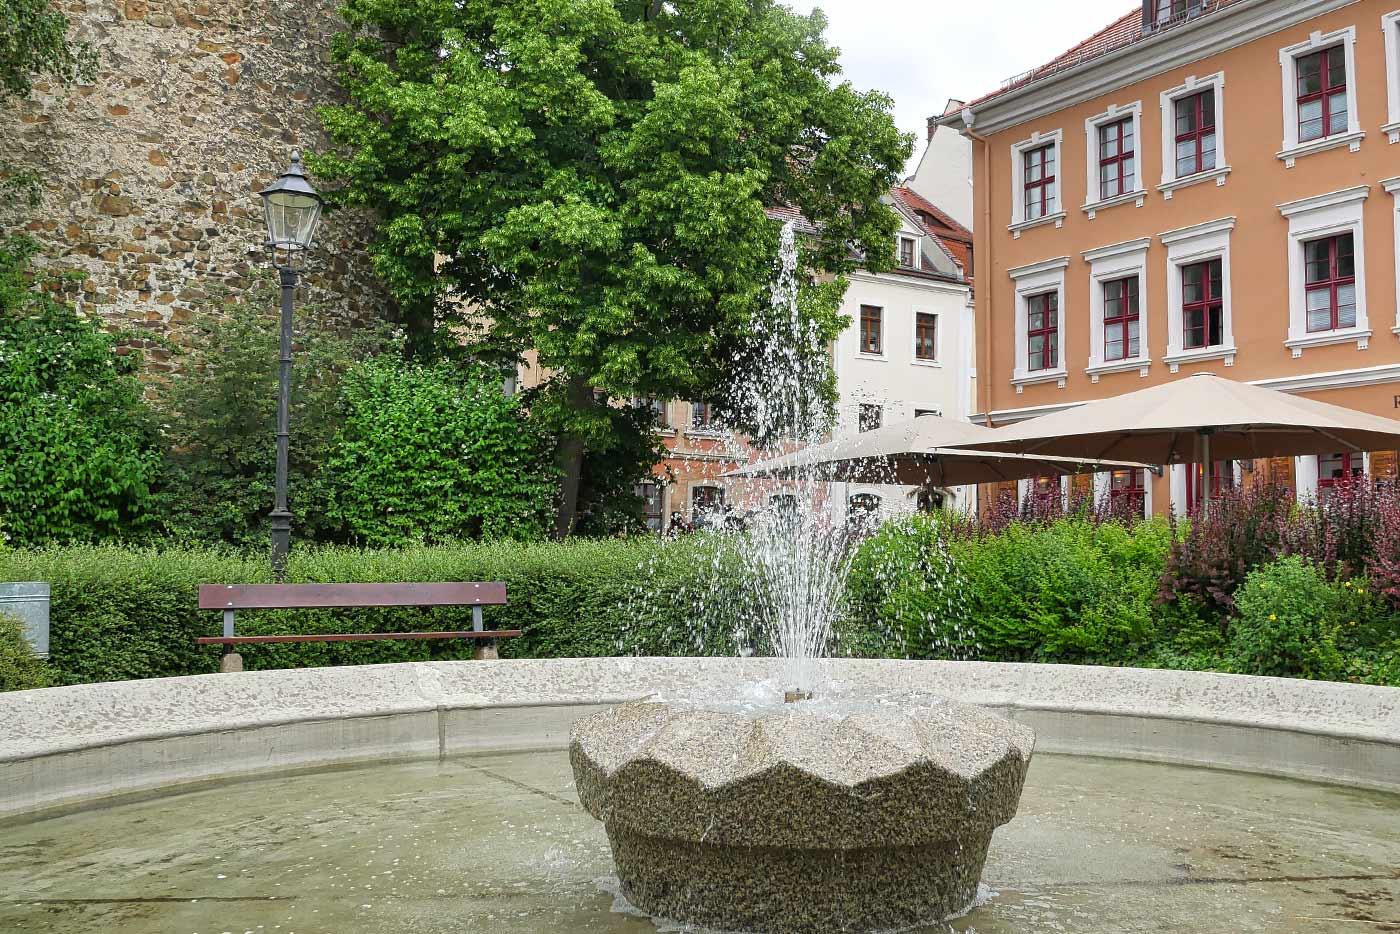 Nikolaibrunnen Goerlitz